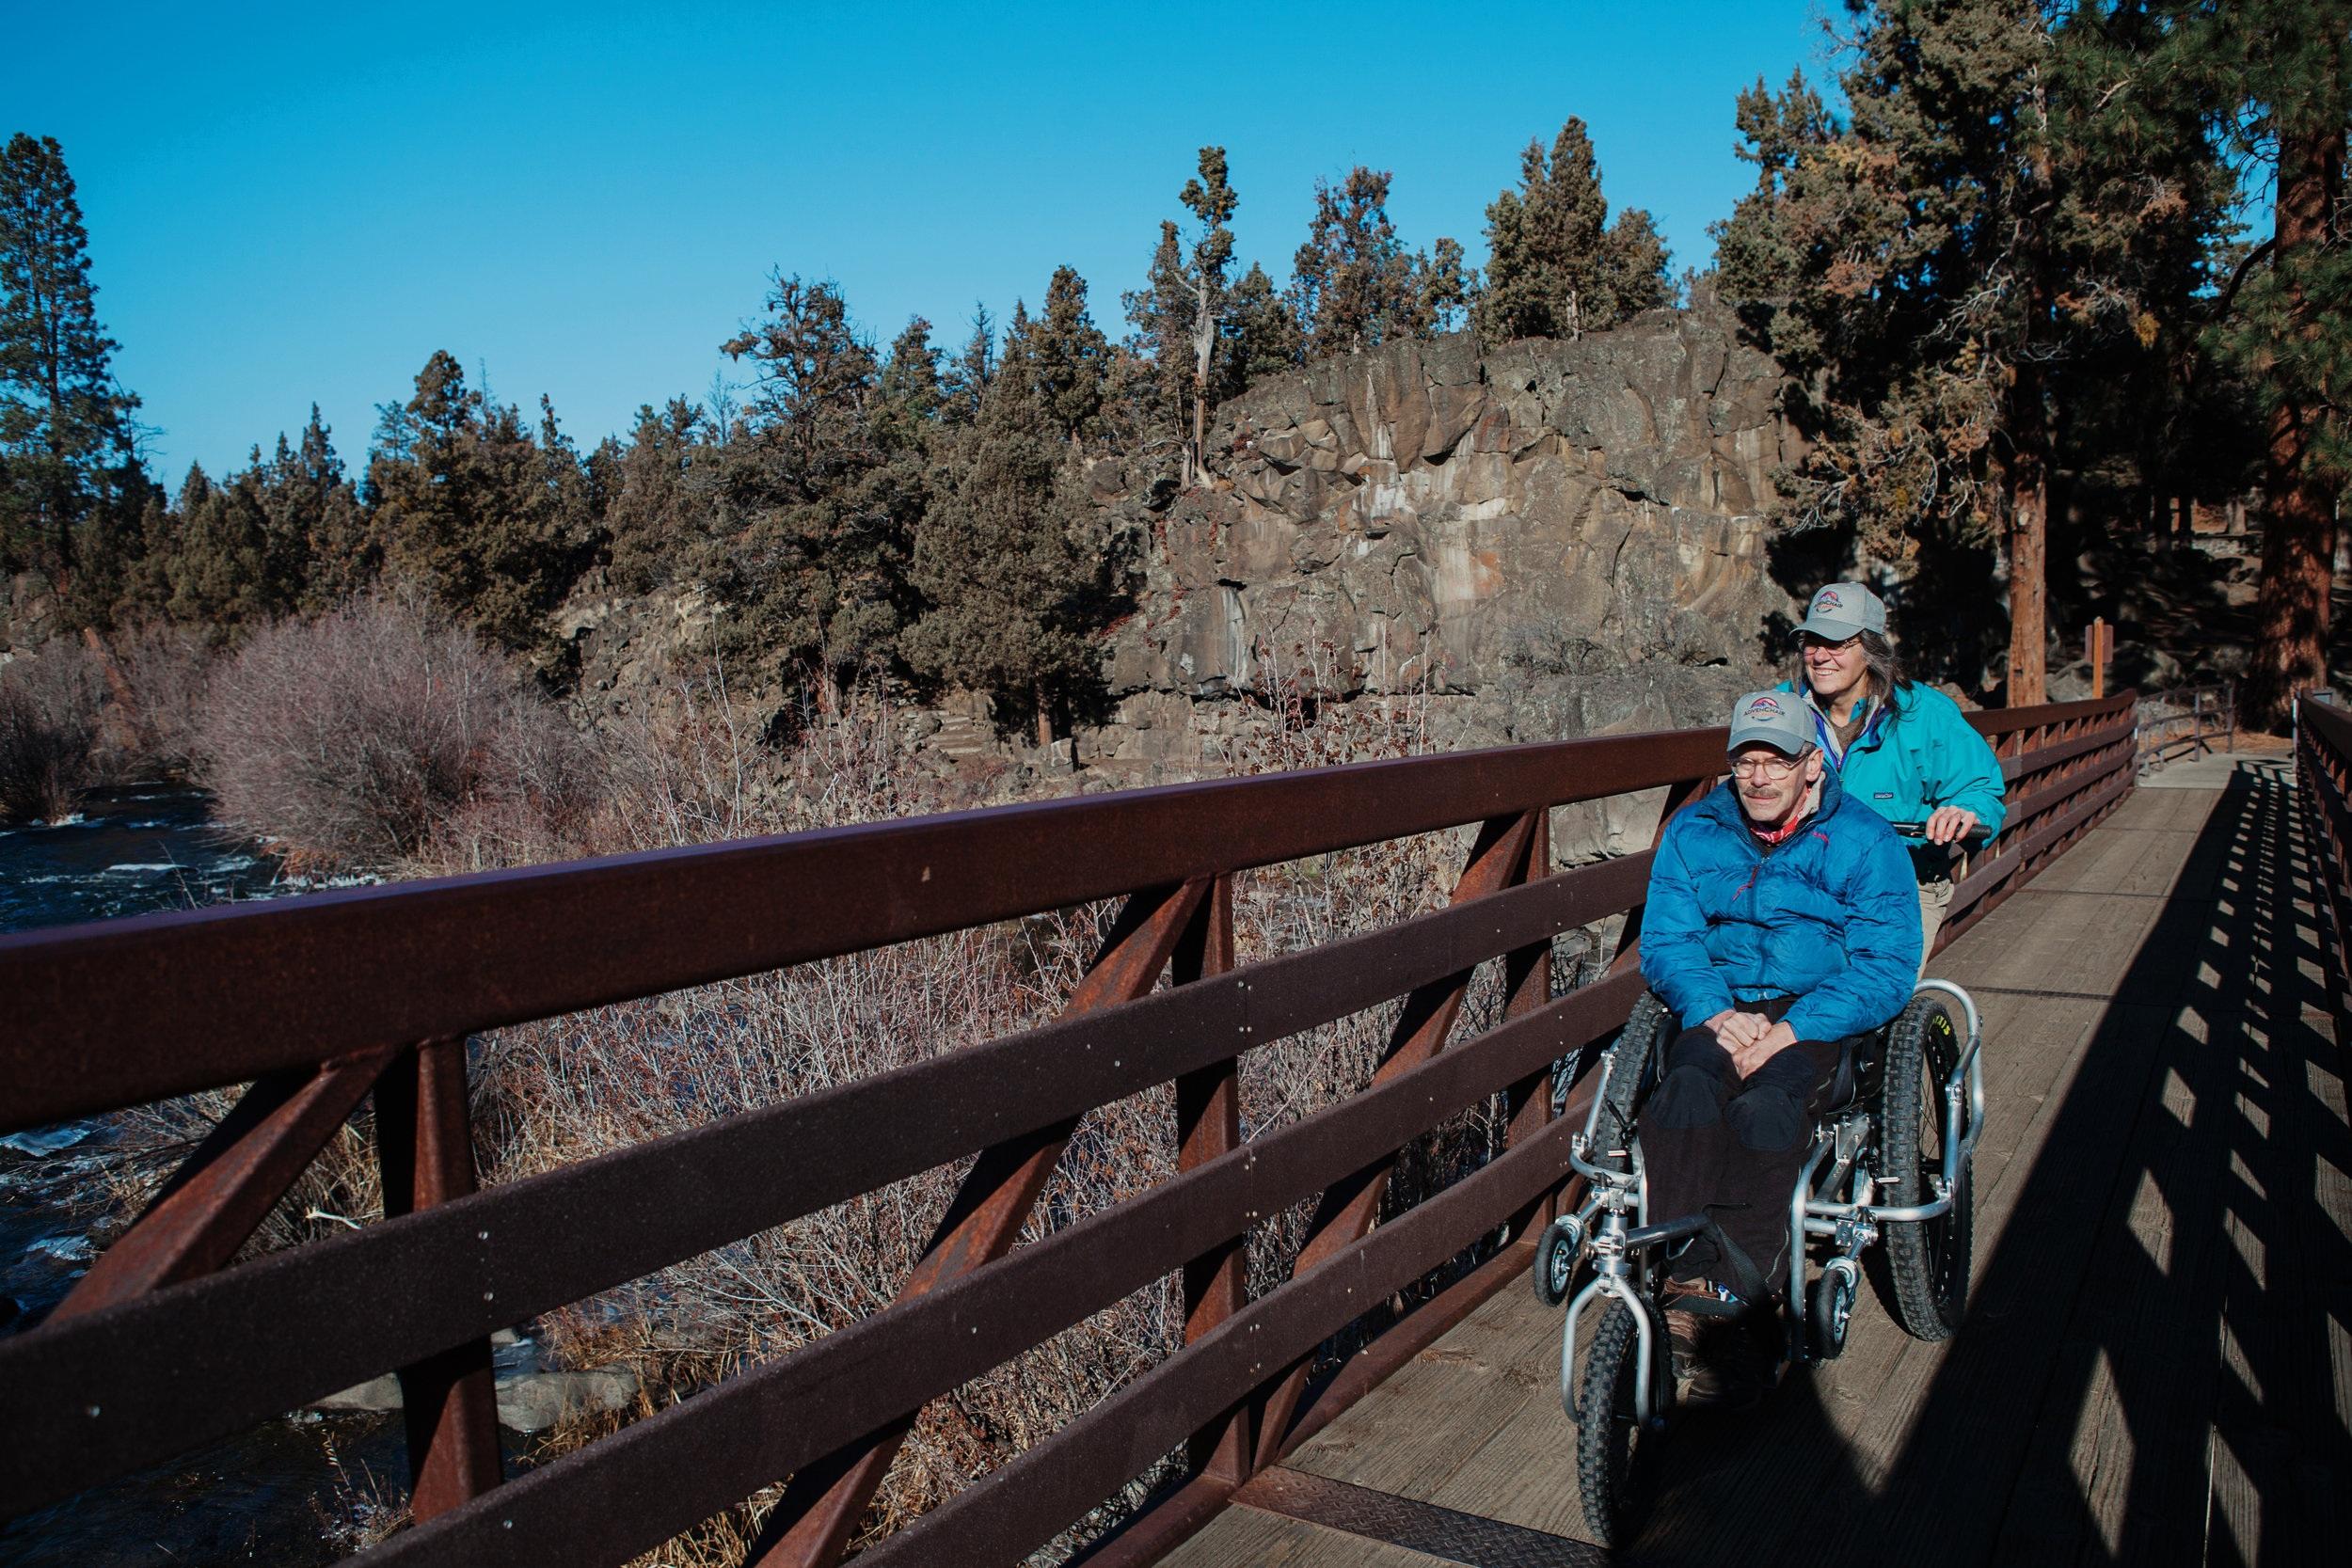 AdvenChair-offroad-wheelchair-Bend-Oregon-064.jpg